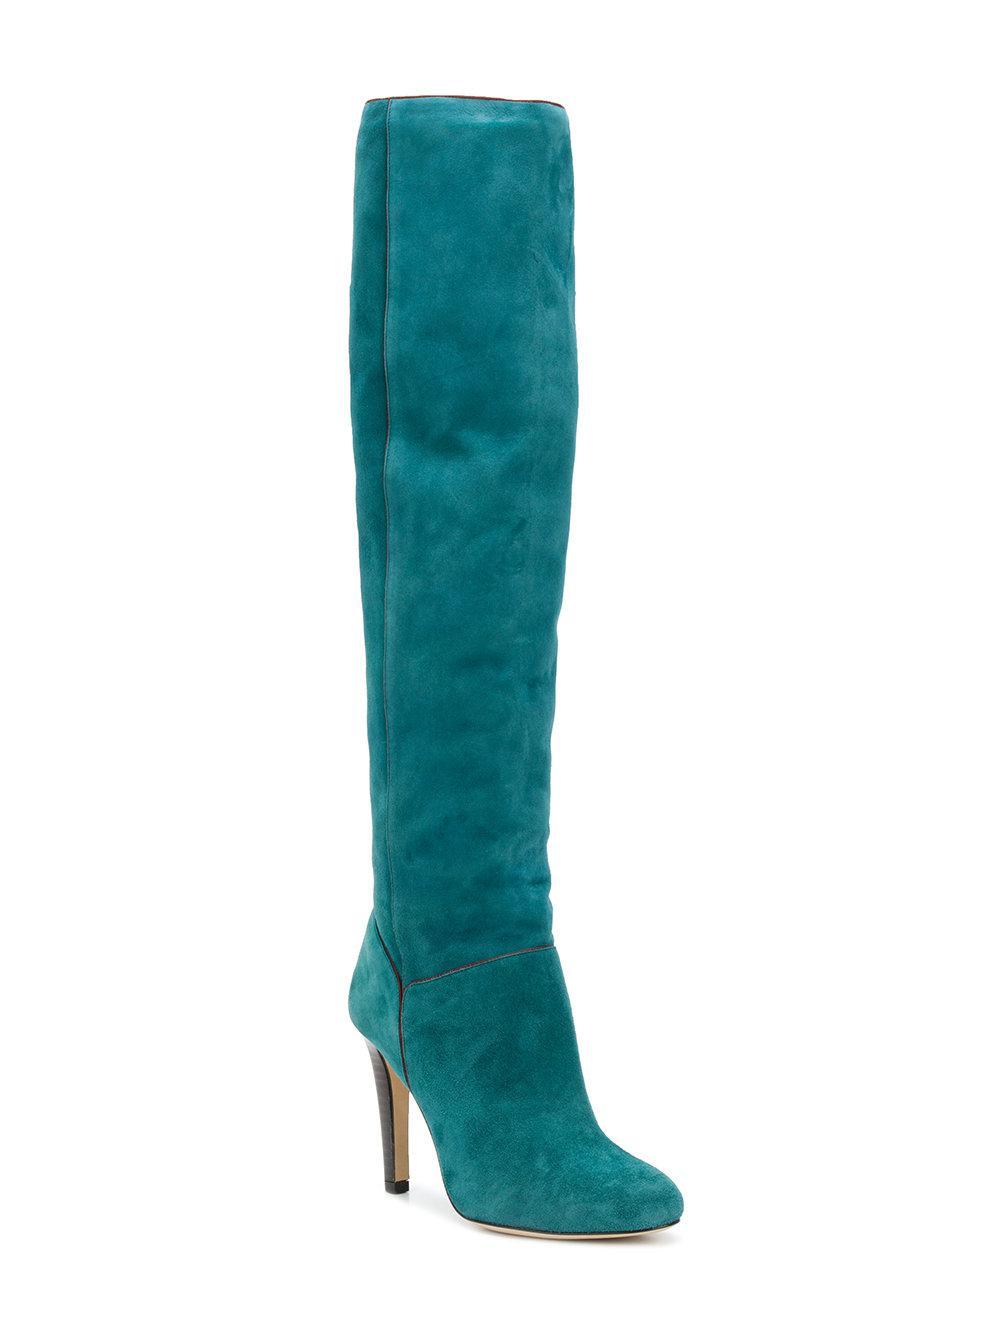 Vanessa Blue Boots